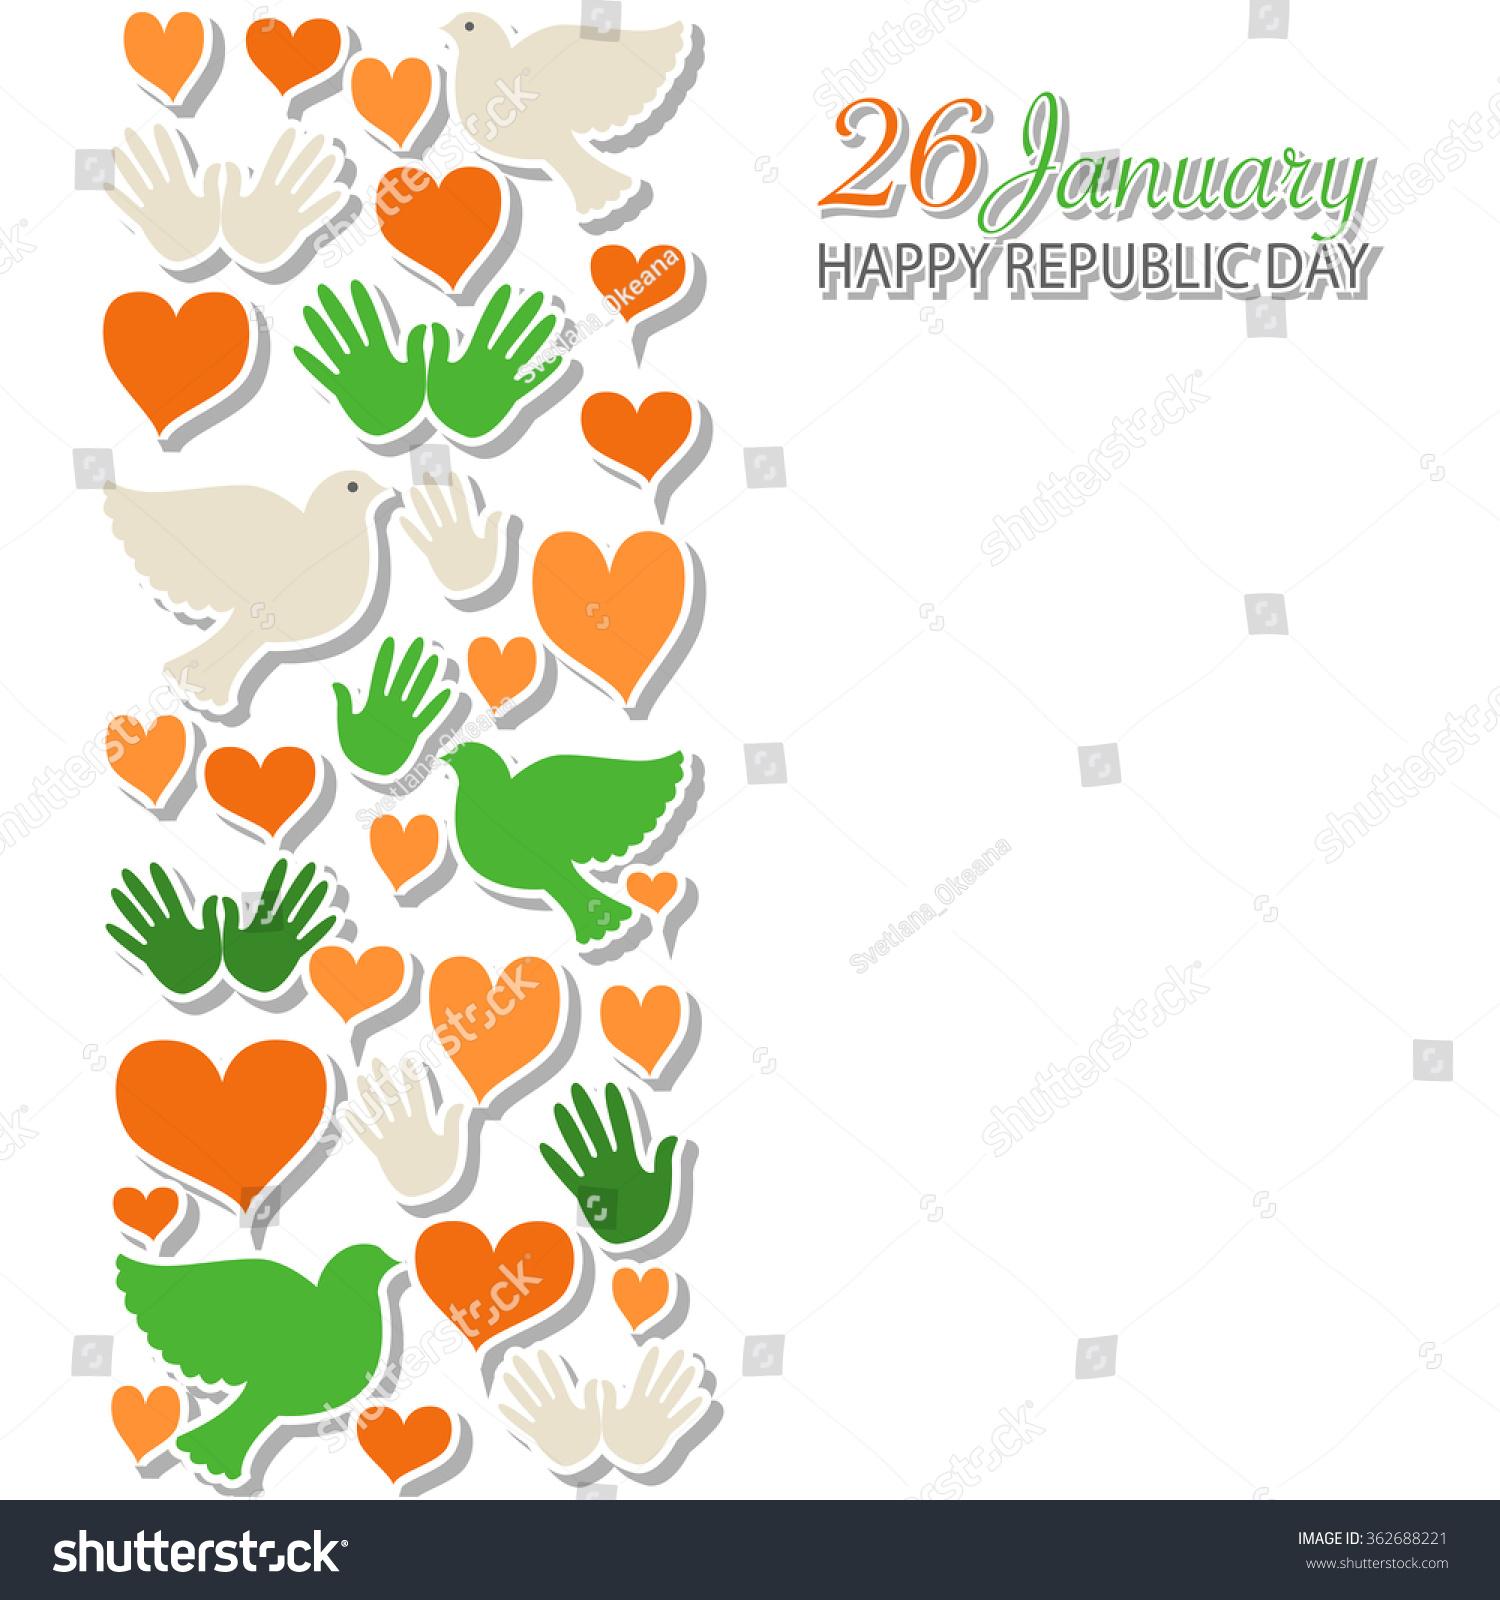 Happy Republic Day India Vector Illustration Stock Image